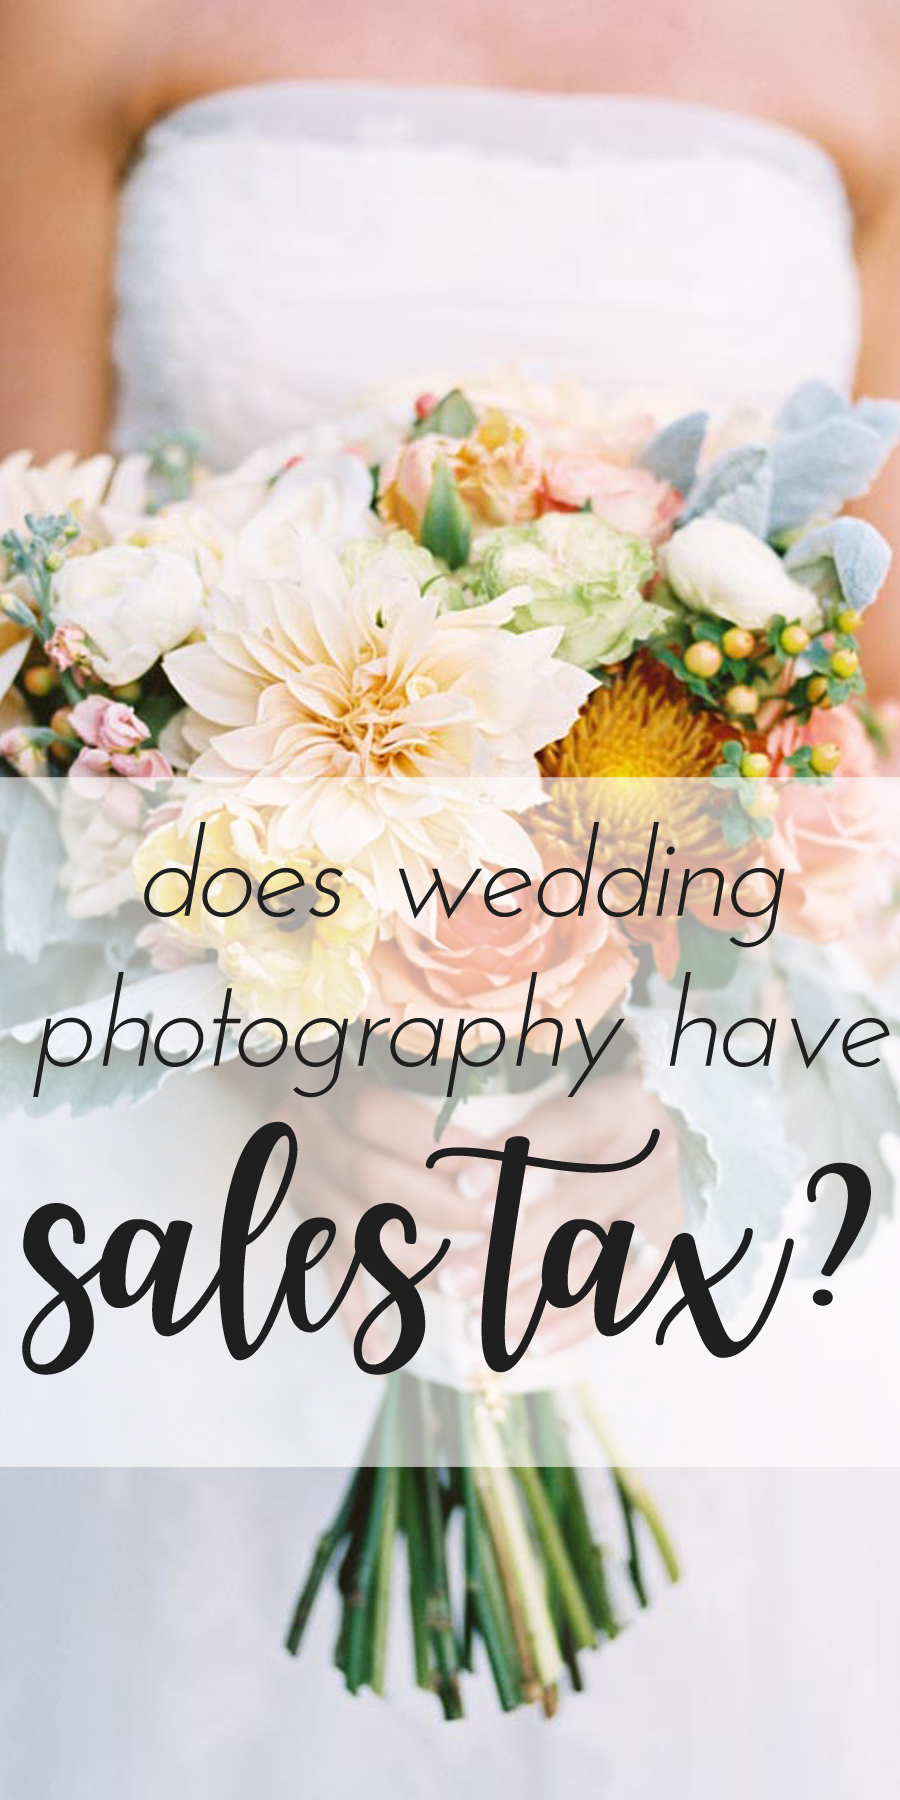 sales tax on wedding photography.jpg